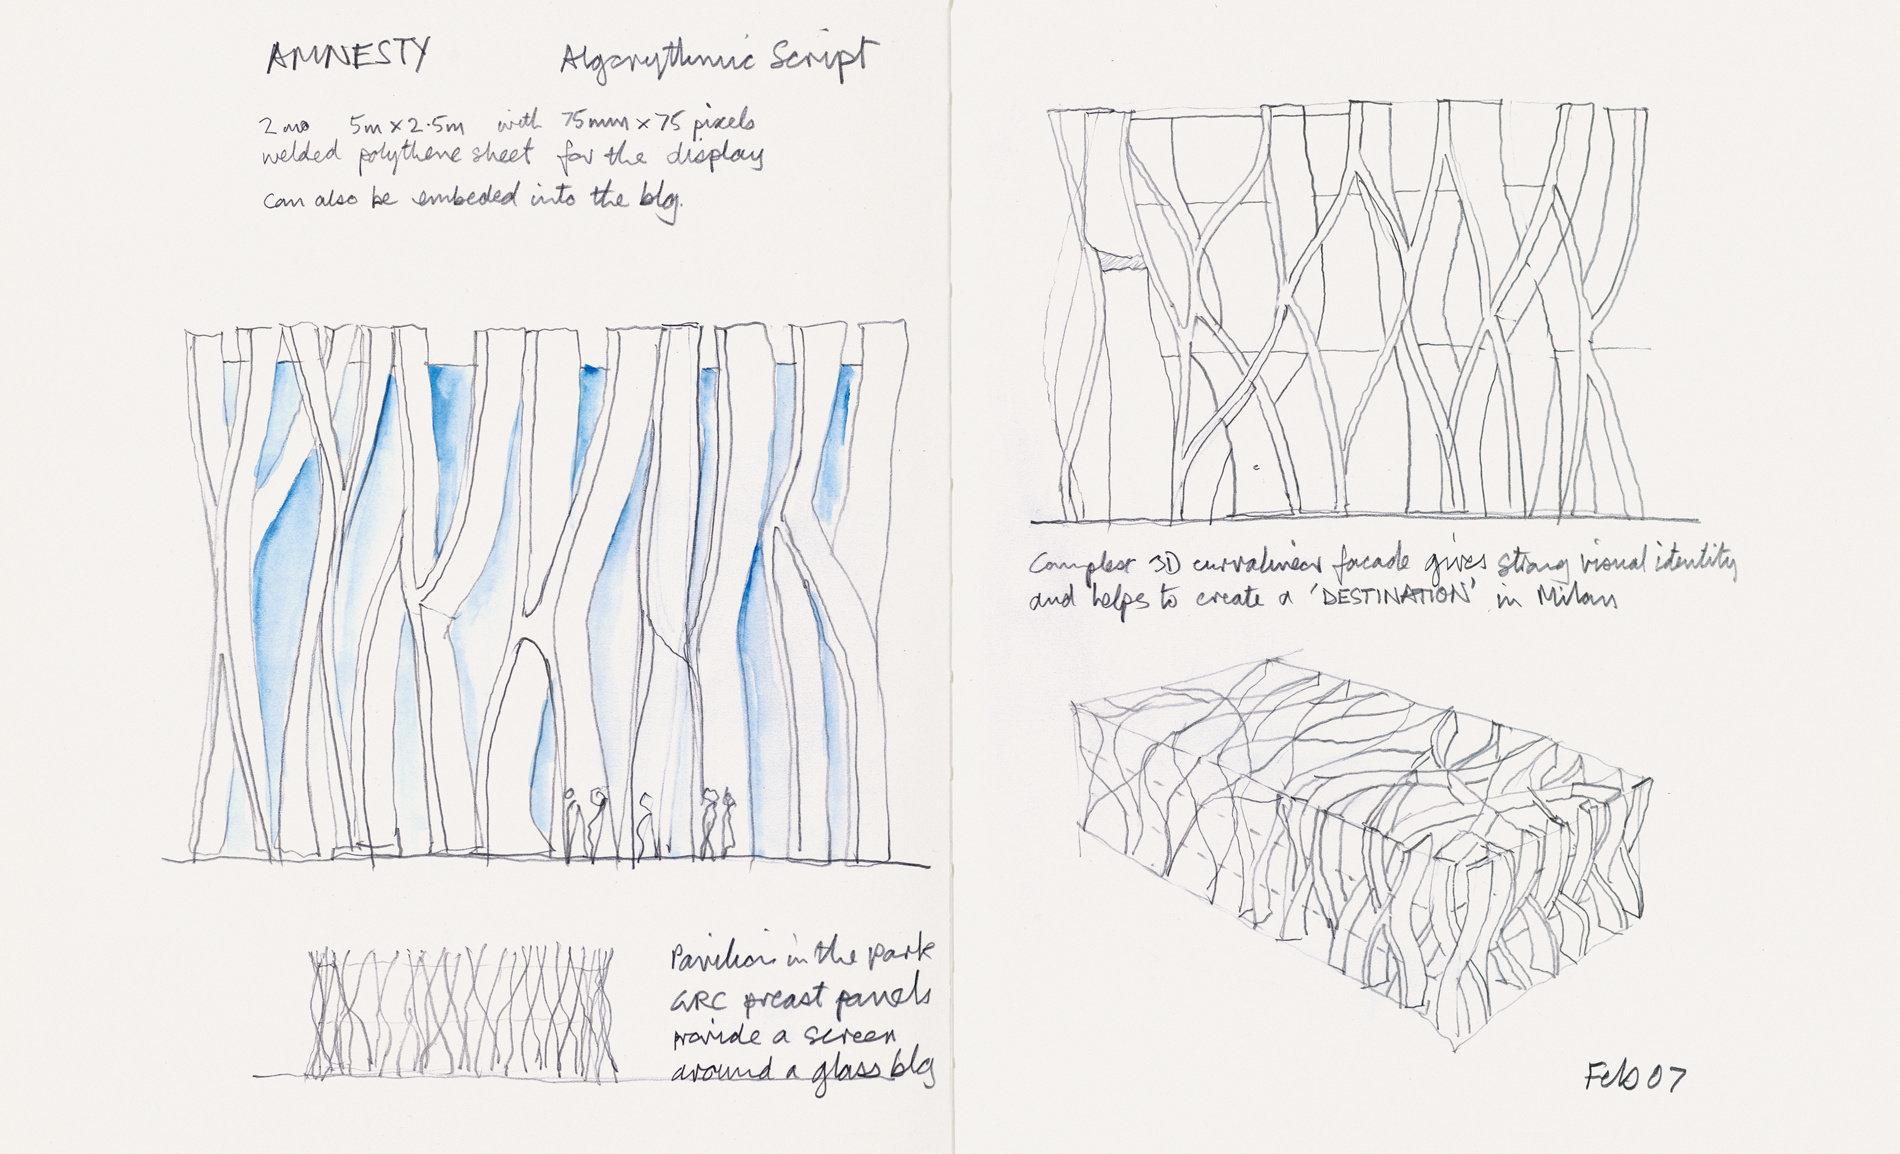 RA The Sketchbooks Of Chris Wilkinson